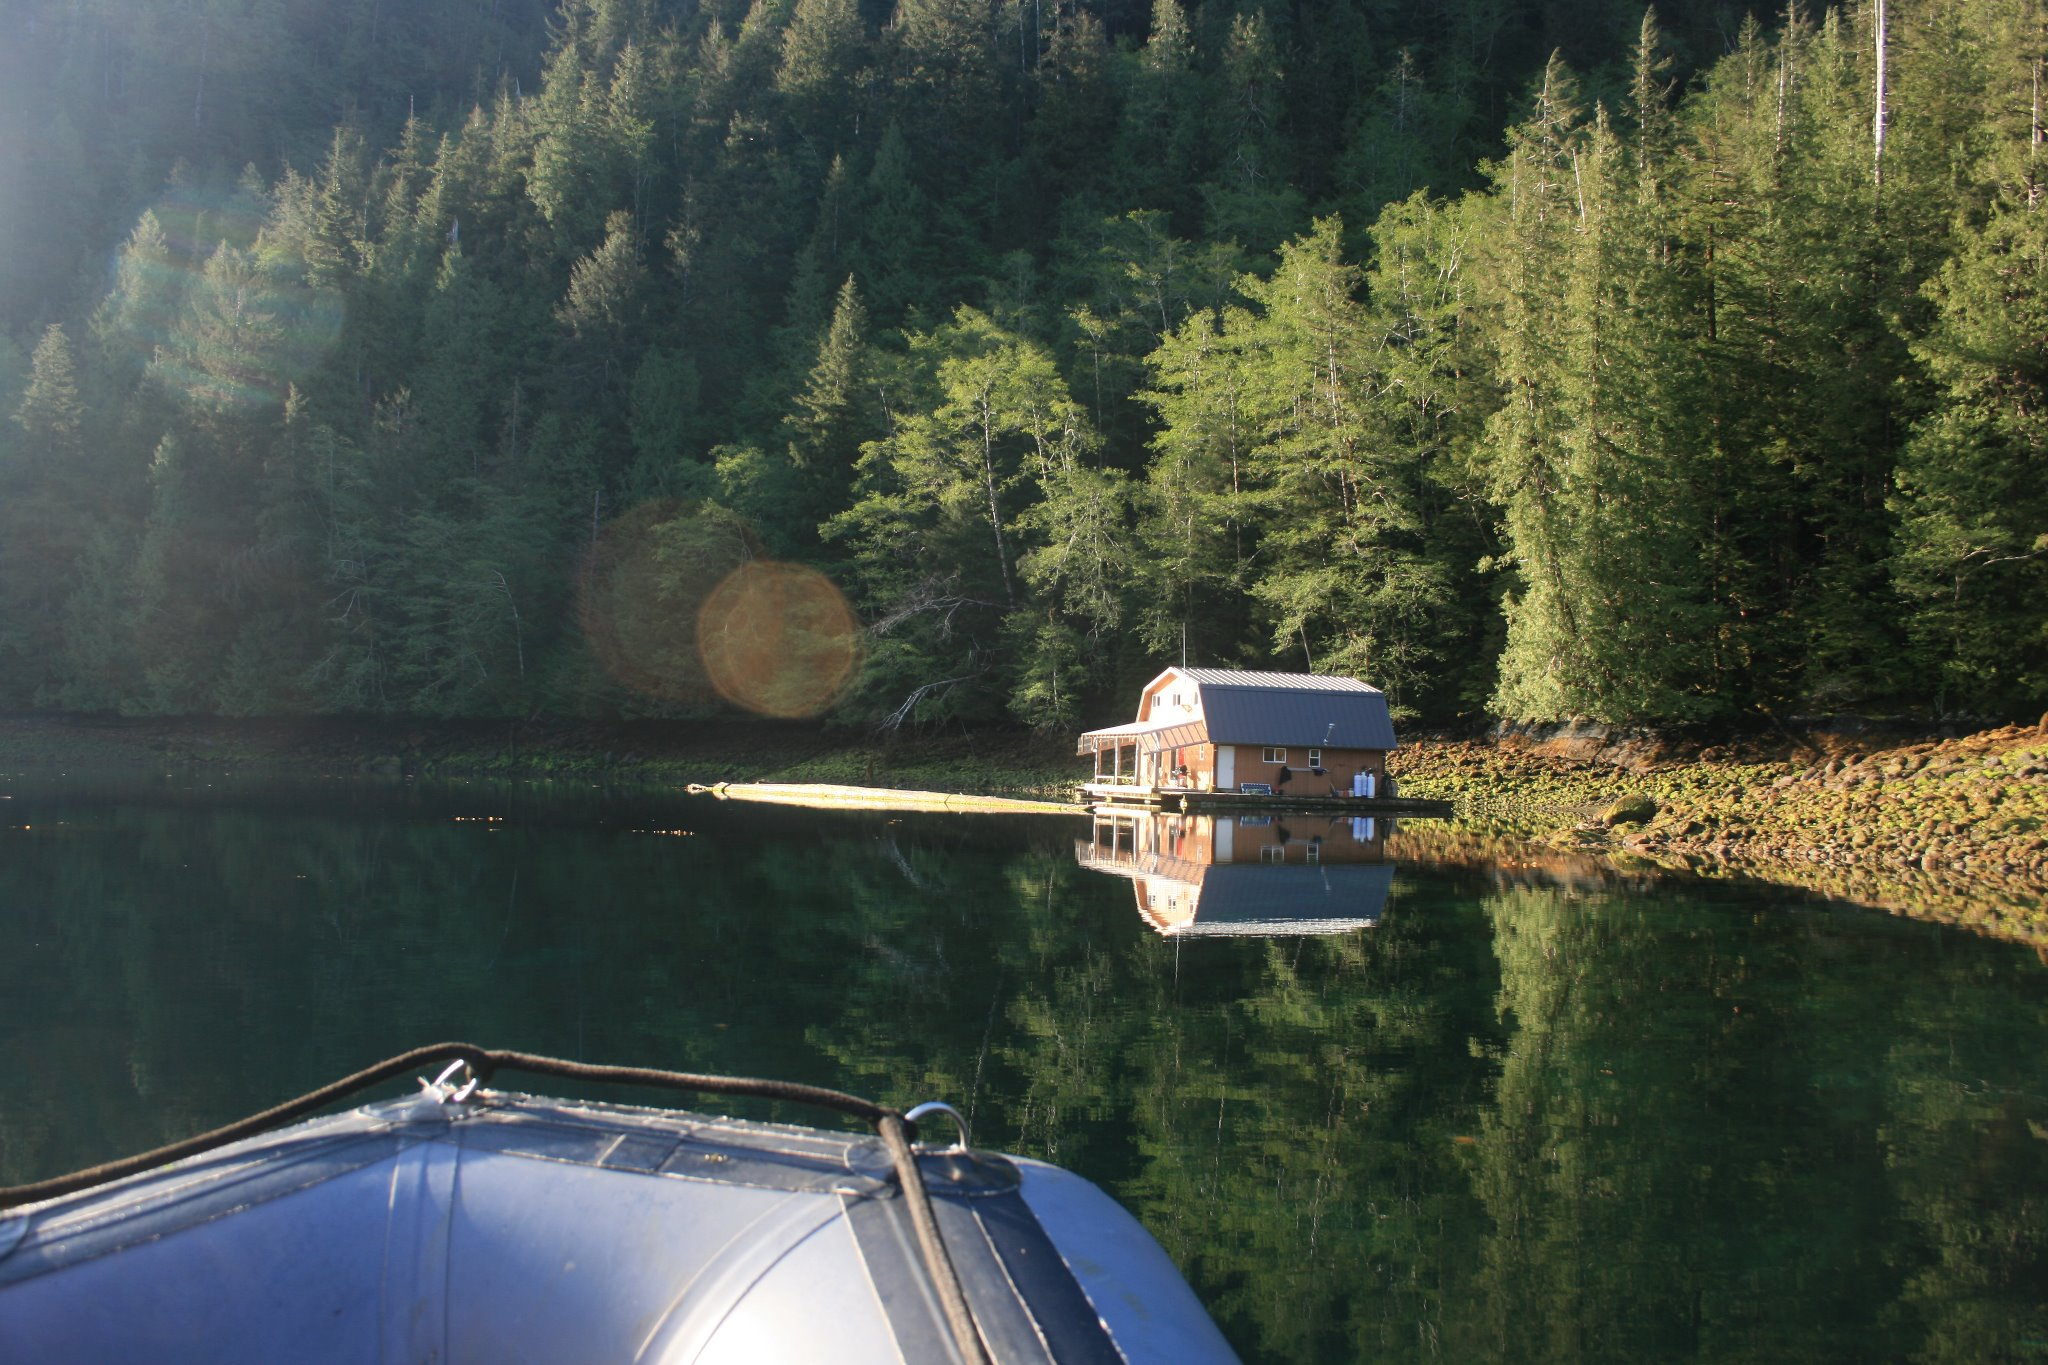 floathouse1.jpg